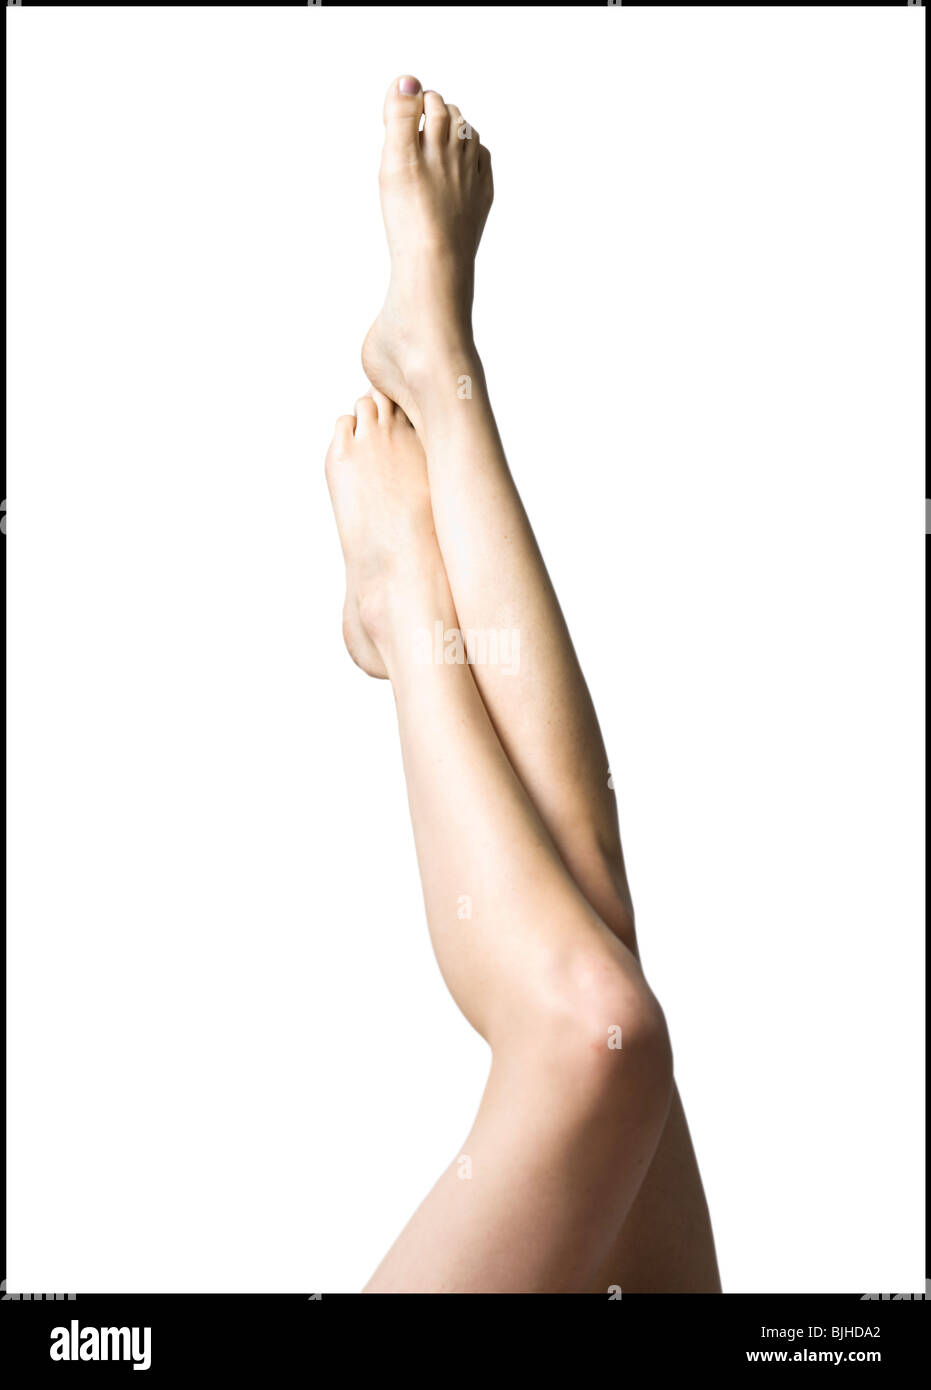 woman's legs - Stock Image